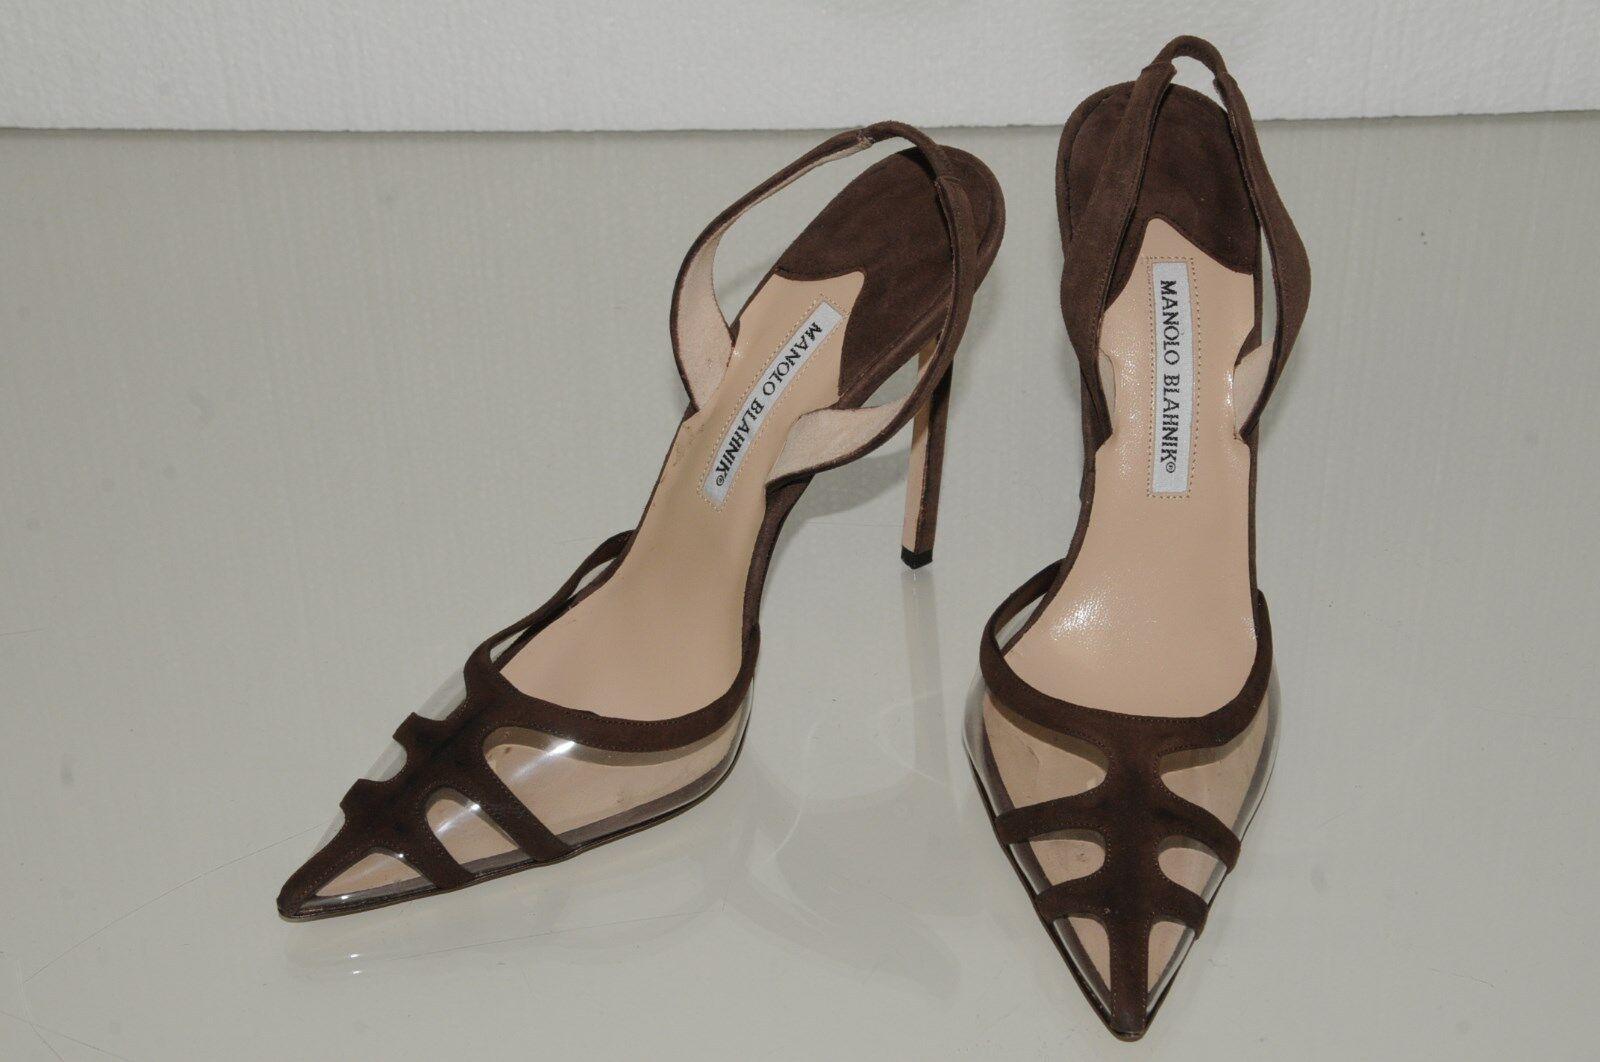 Neuf Femmeolo Blahnik Carolyne Marron Daim Marron Carolyne PVC Bb 130 Talon Licou Chaussures 40.5 82fba0